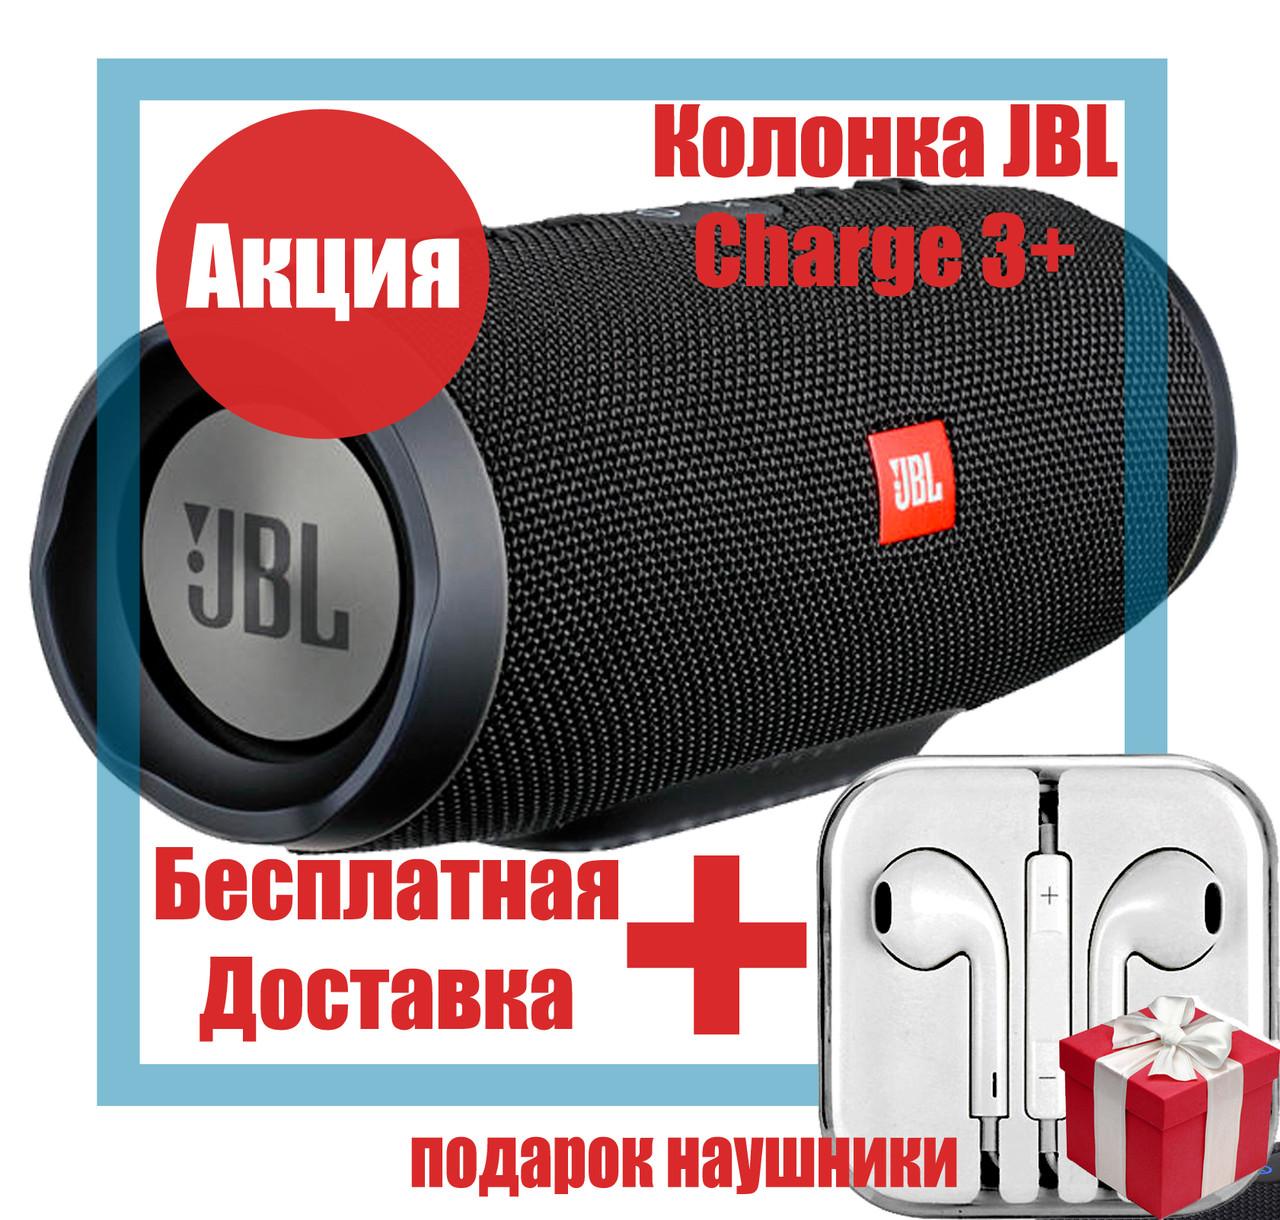 Качество звука! Портативная Bluetooth колонка JBL Charge3+ microSD, зарядка телефона 20W QualitiReplica